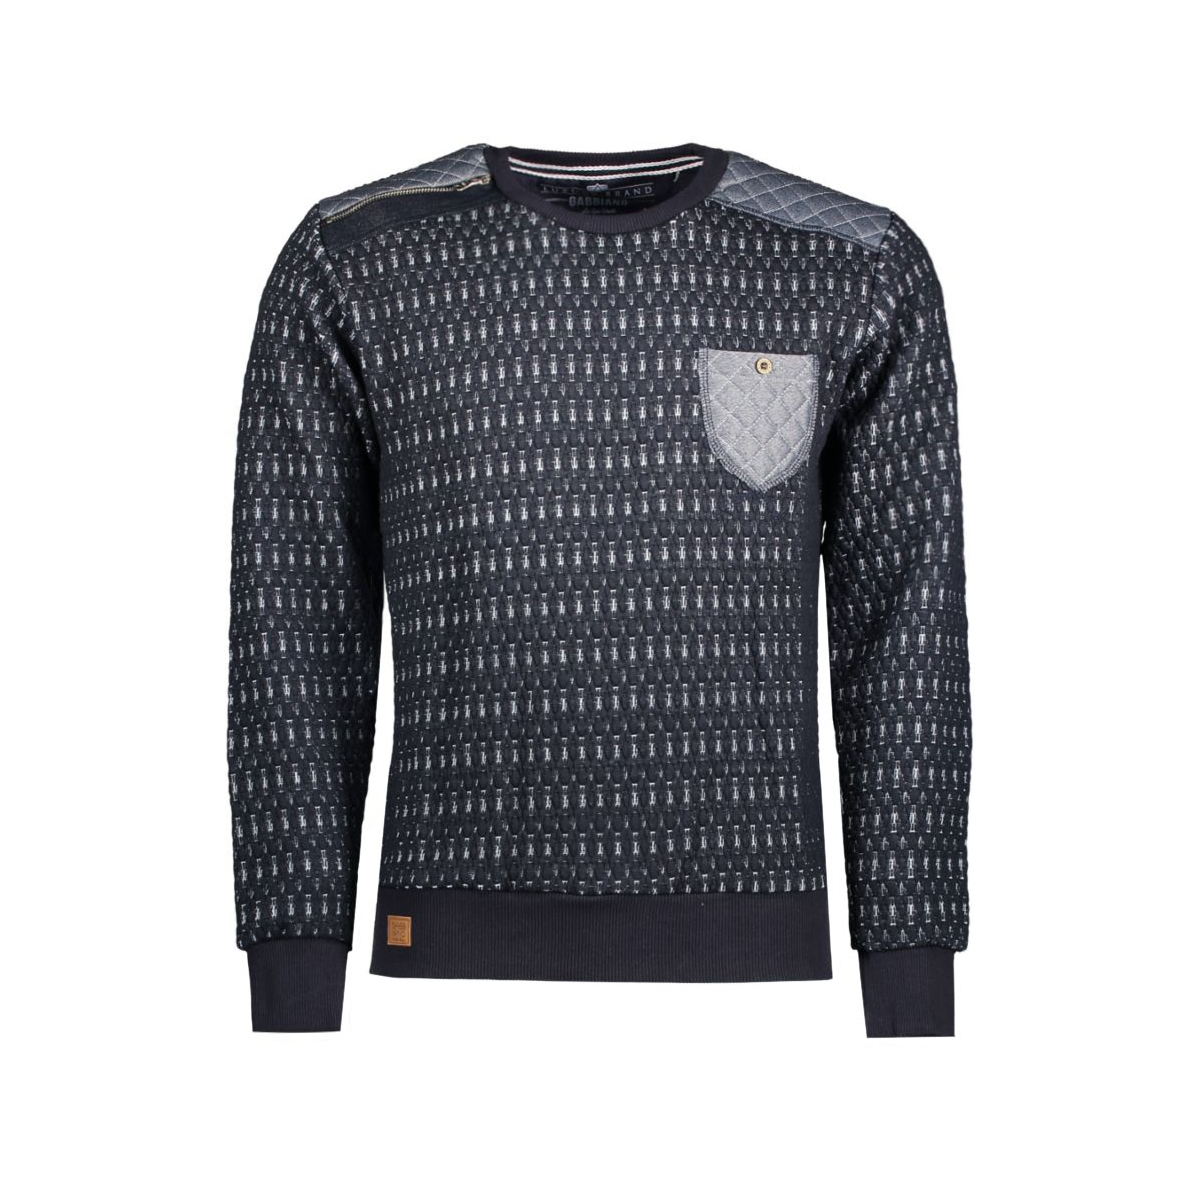 5410 gabbiano sweater navy